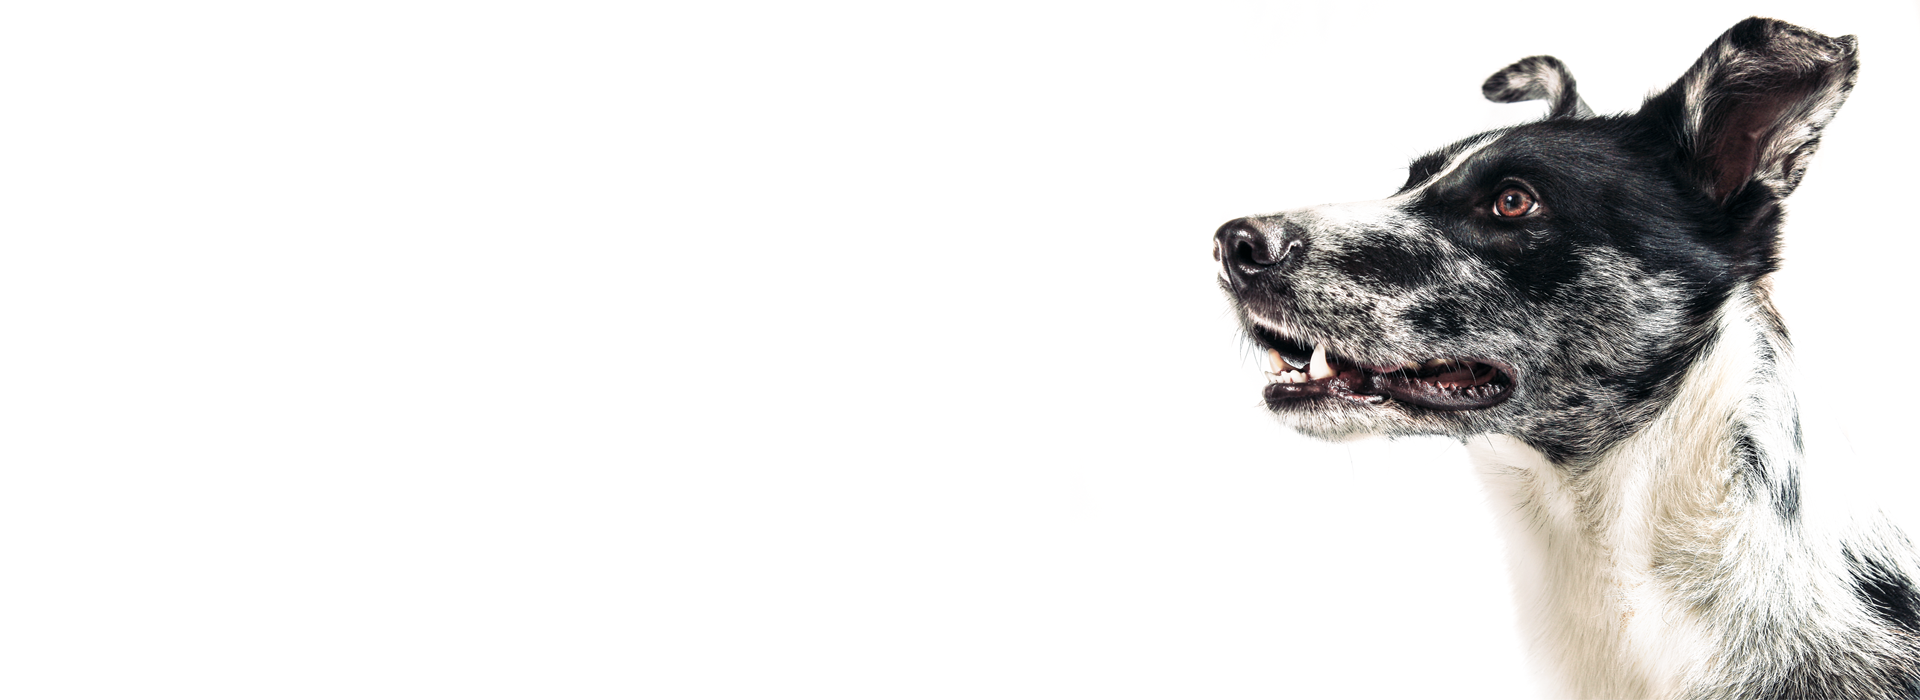 pet photography fotografia animali